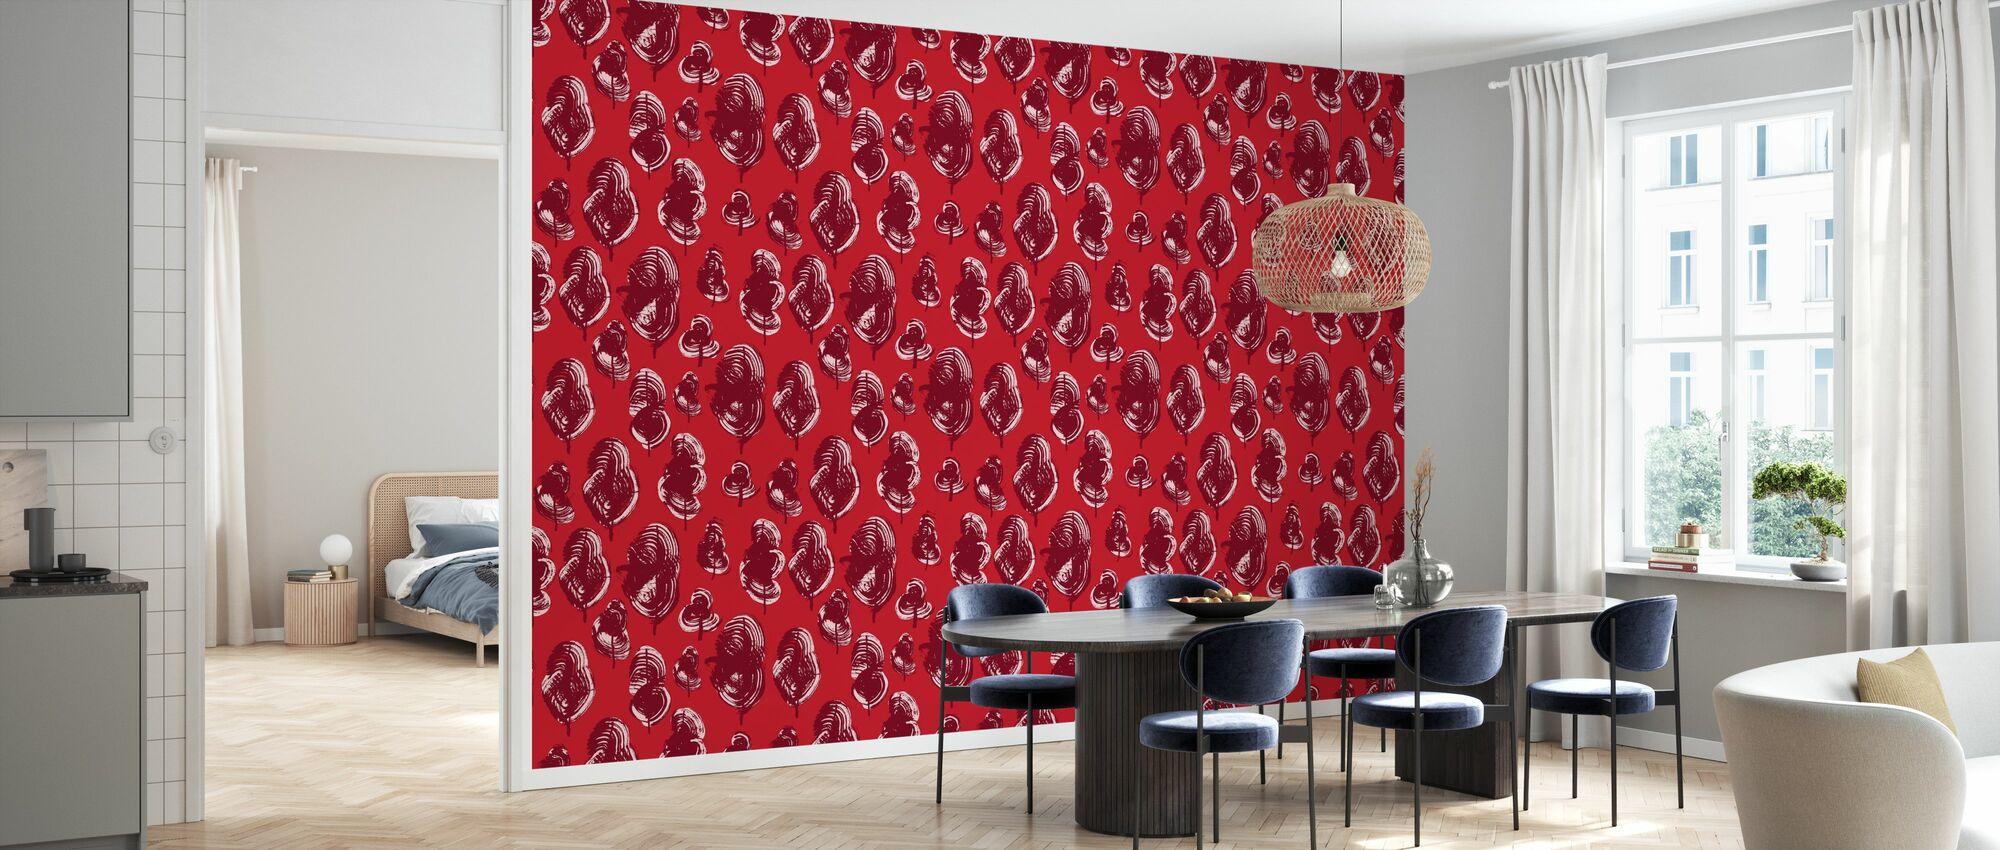 Leaves - Red Poppy - Wallpaper - Kitchen